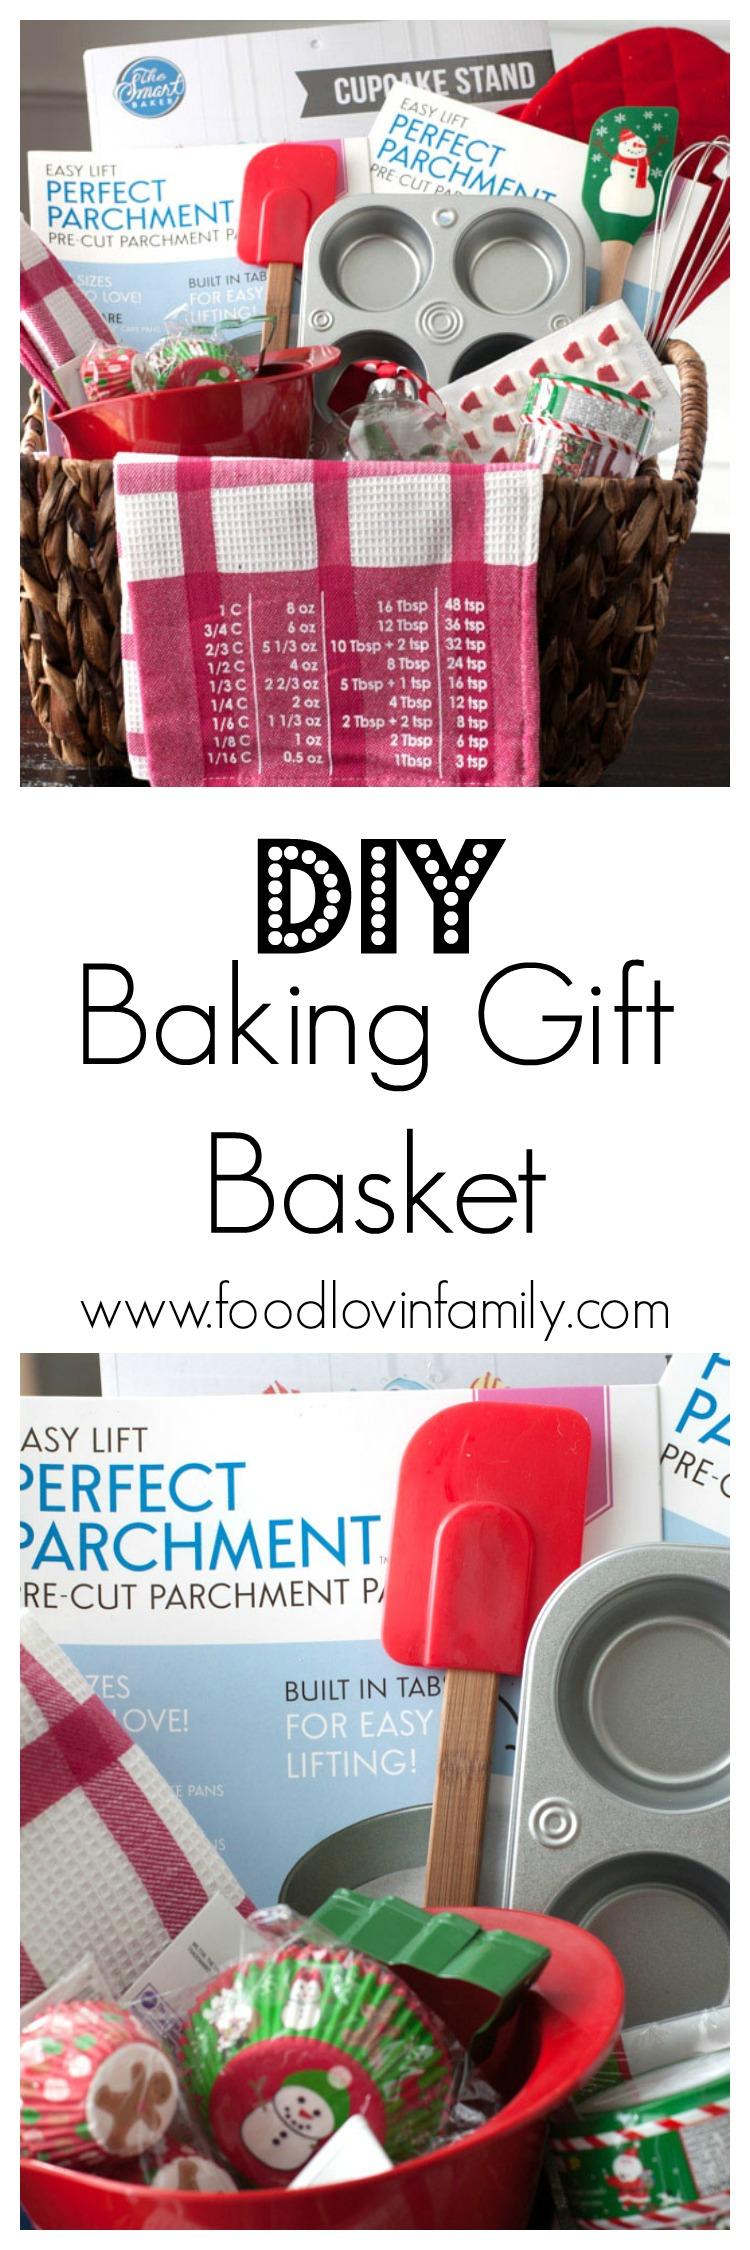 DIY Baking Gift Basket - Food Lovin Family